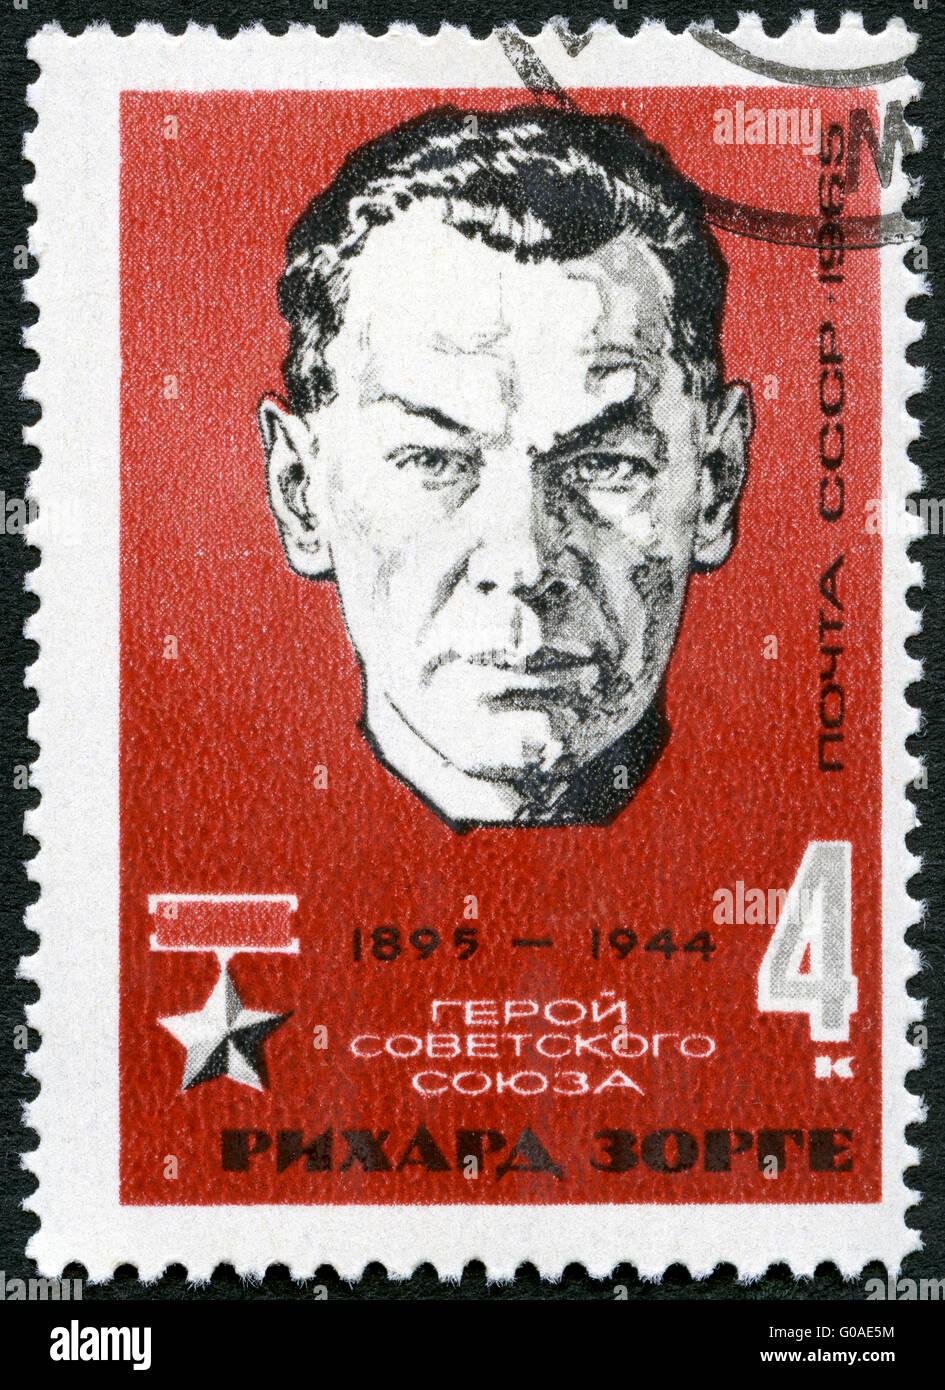 USSR - 1965: shows portrait of Richard Sorge (1895-1944), Soviet spy and Hero of the Soviet Union - Stock Image